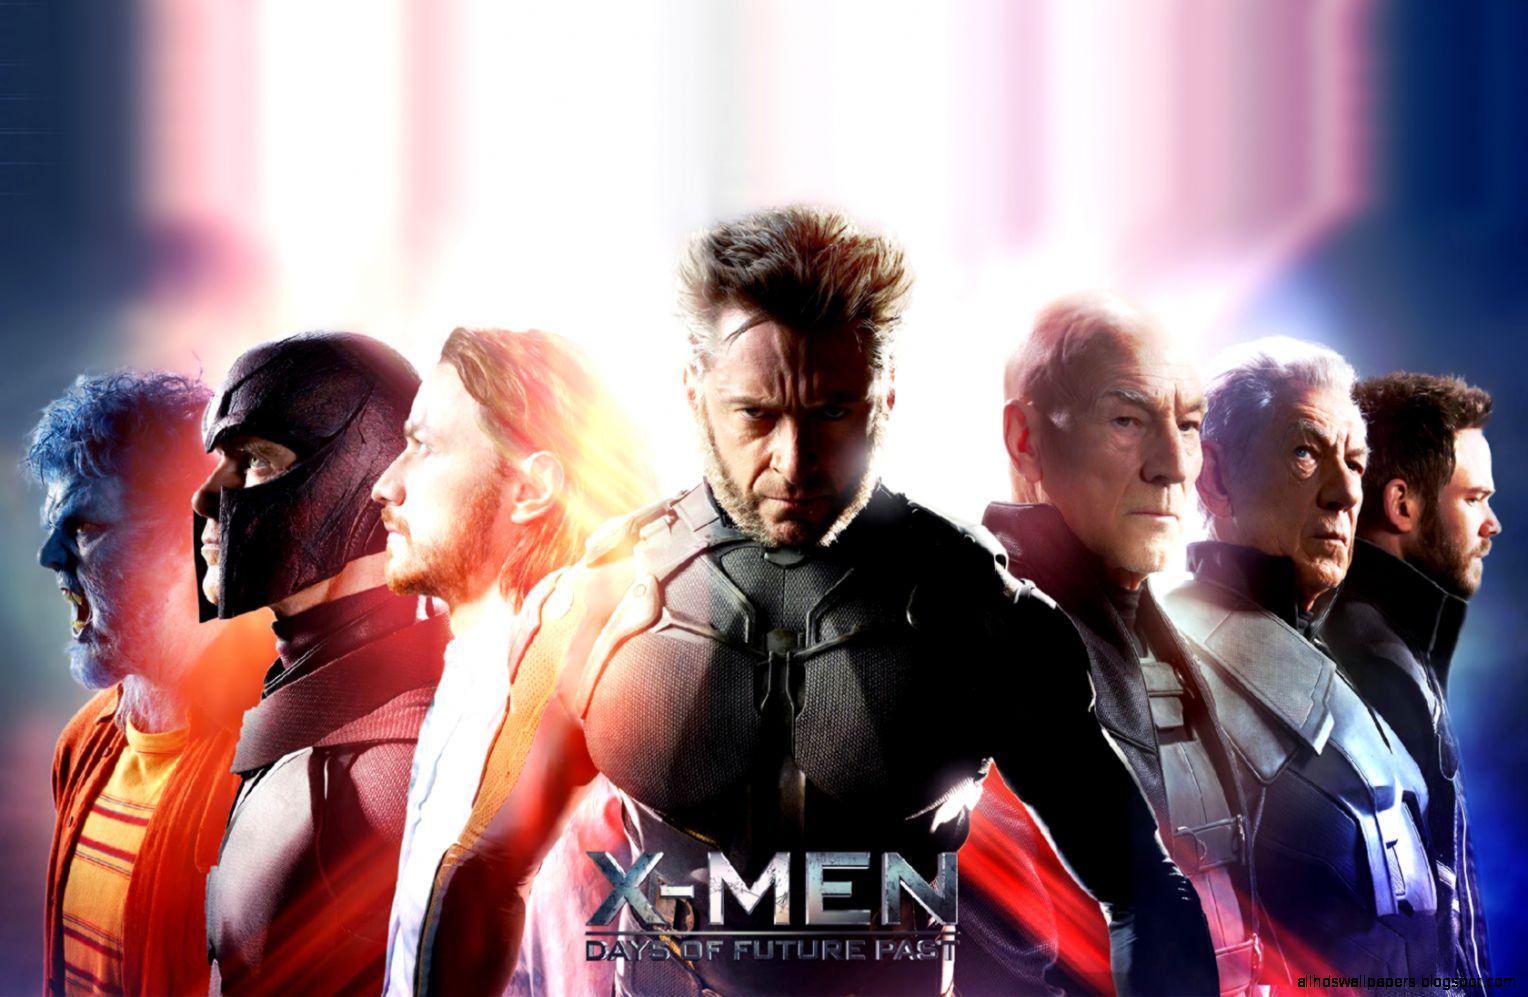 X Men Days Of Future Past Wallpaper: X Men Days Of Future Past Wallpaper 1920X1080